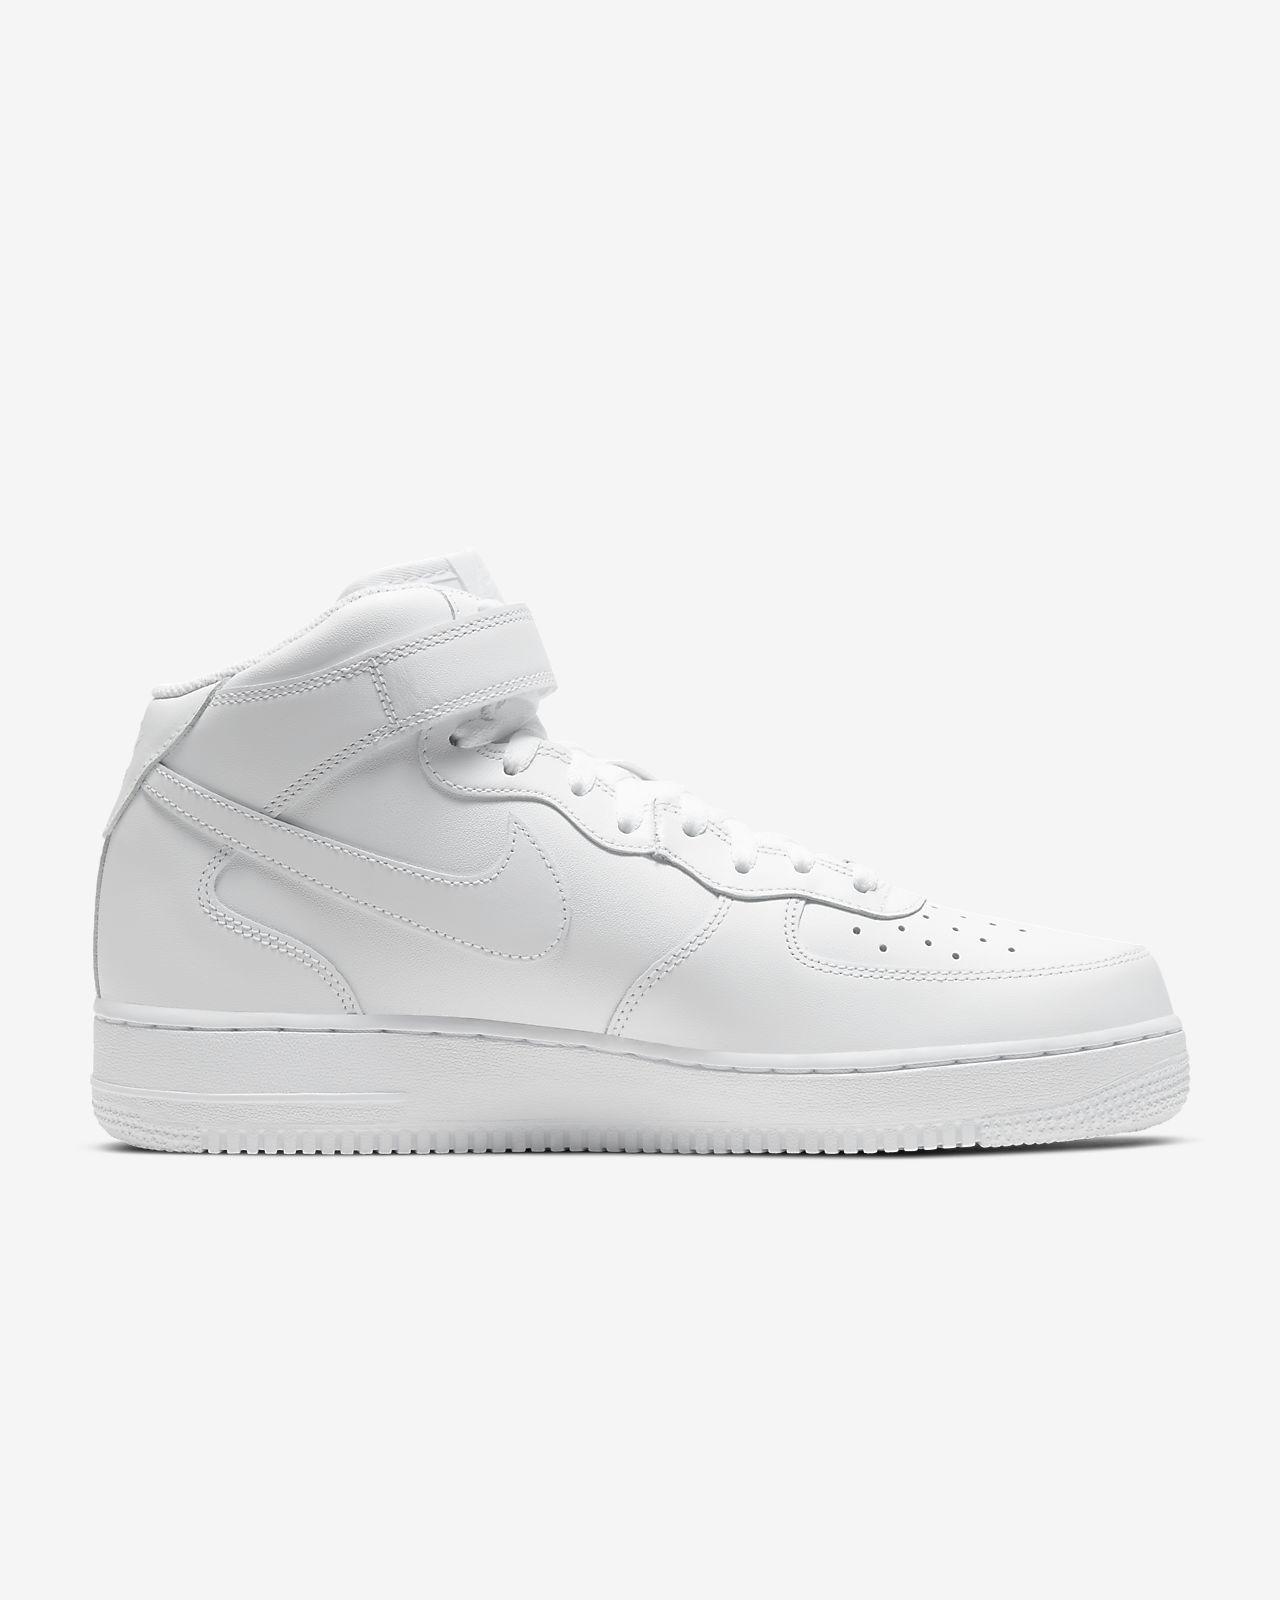 air force 1 mid 07 blancas